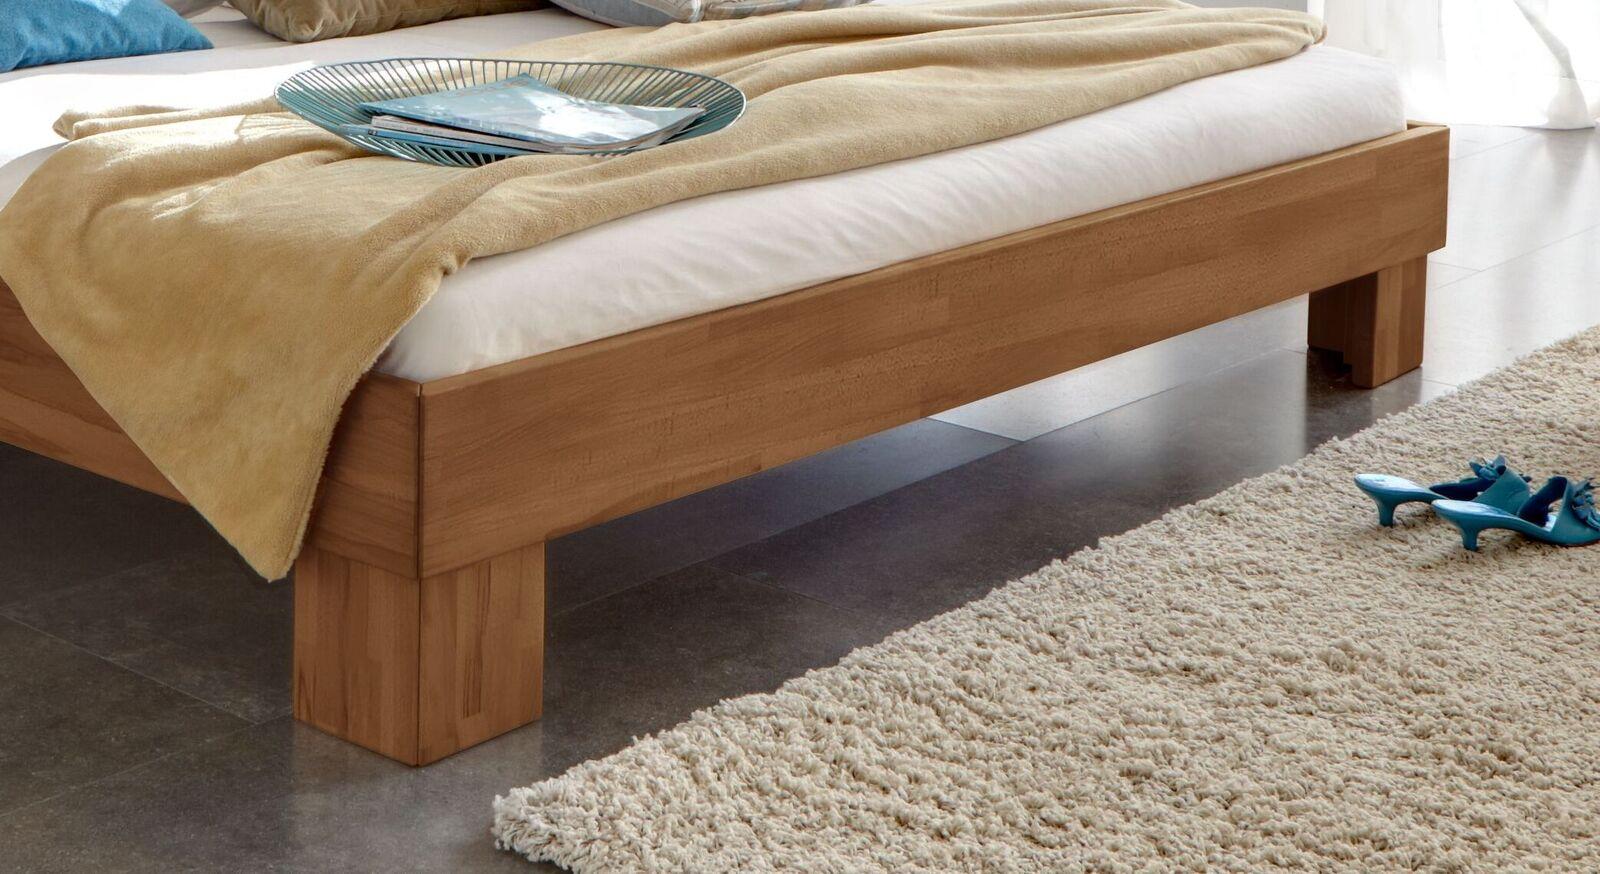 Bett Wood Romance mit stabilen Winkelfüßen